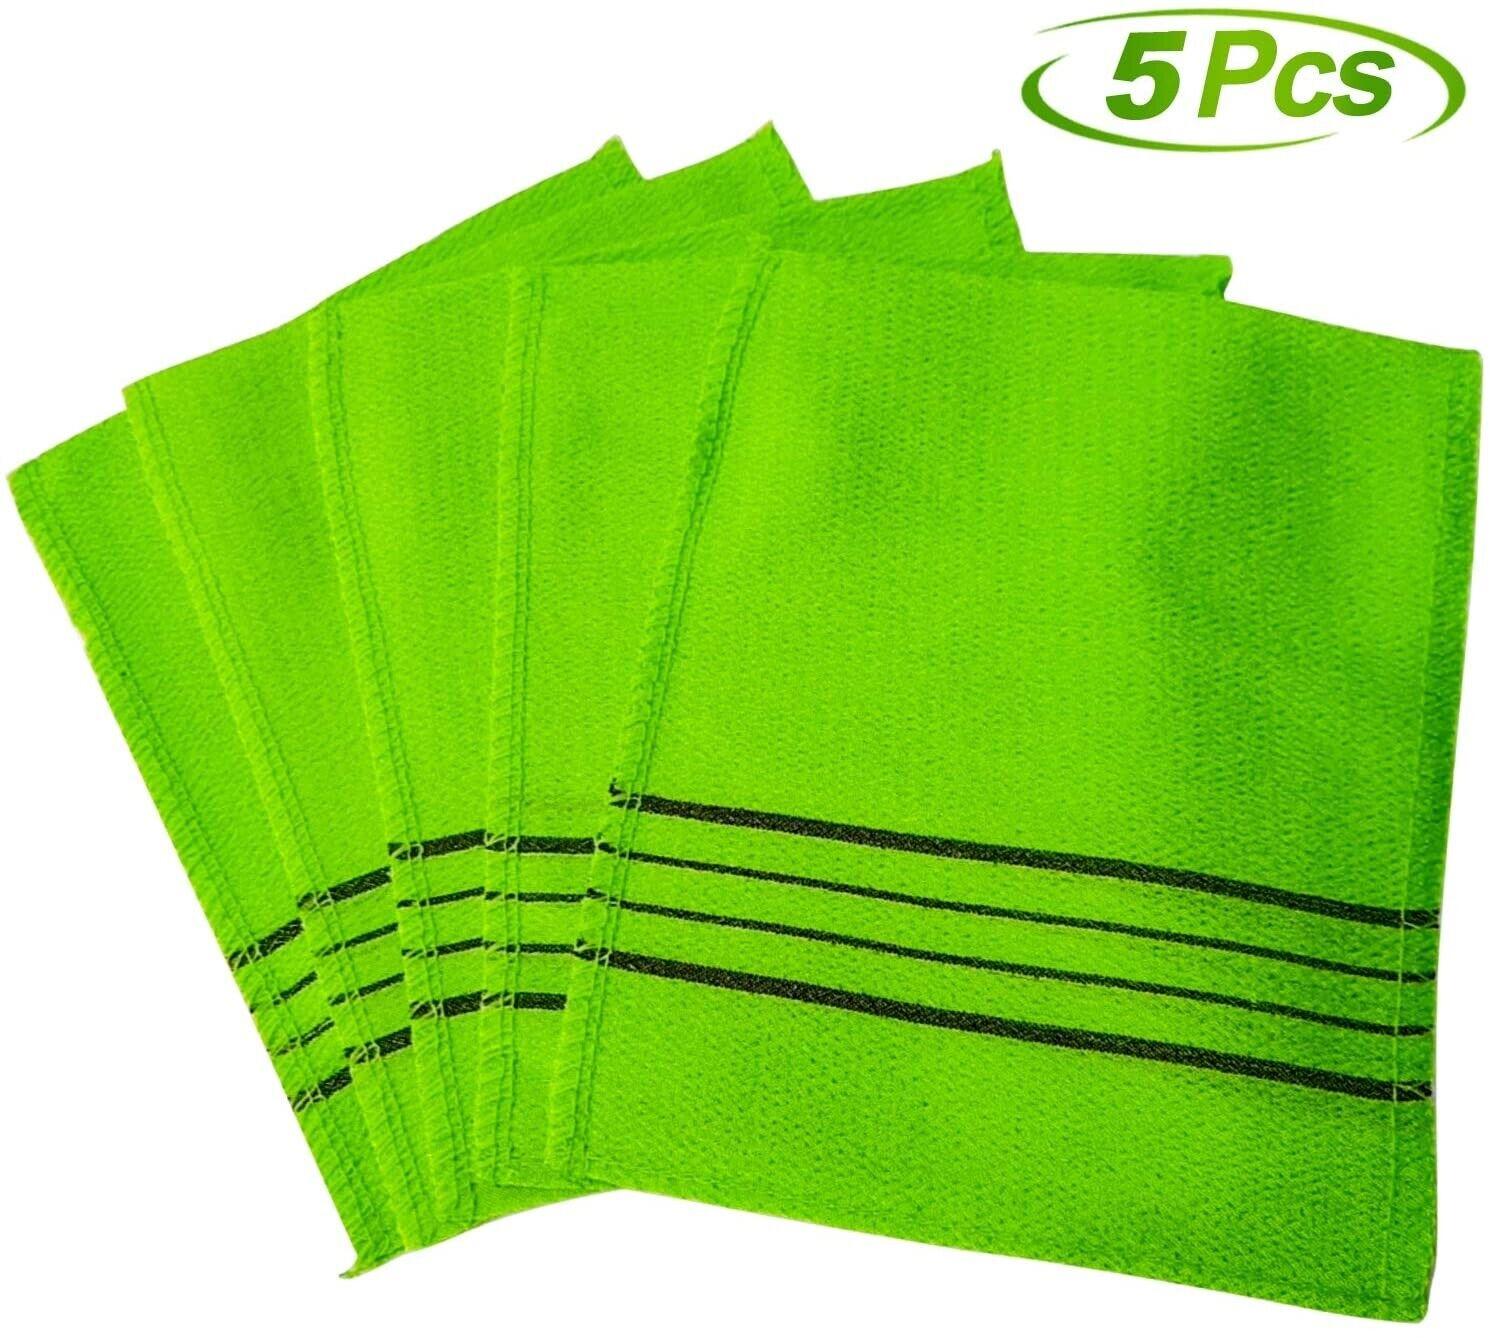 5pcs Korean Italy Towel Exfoliating Long Viscose Bath Back W